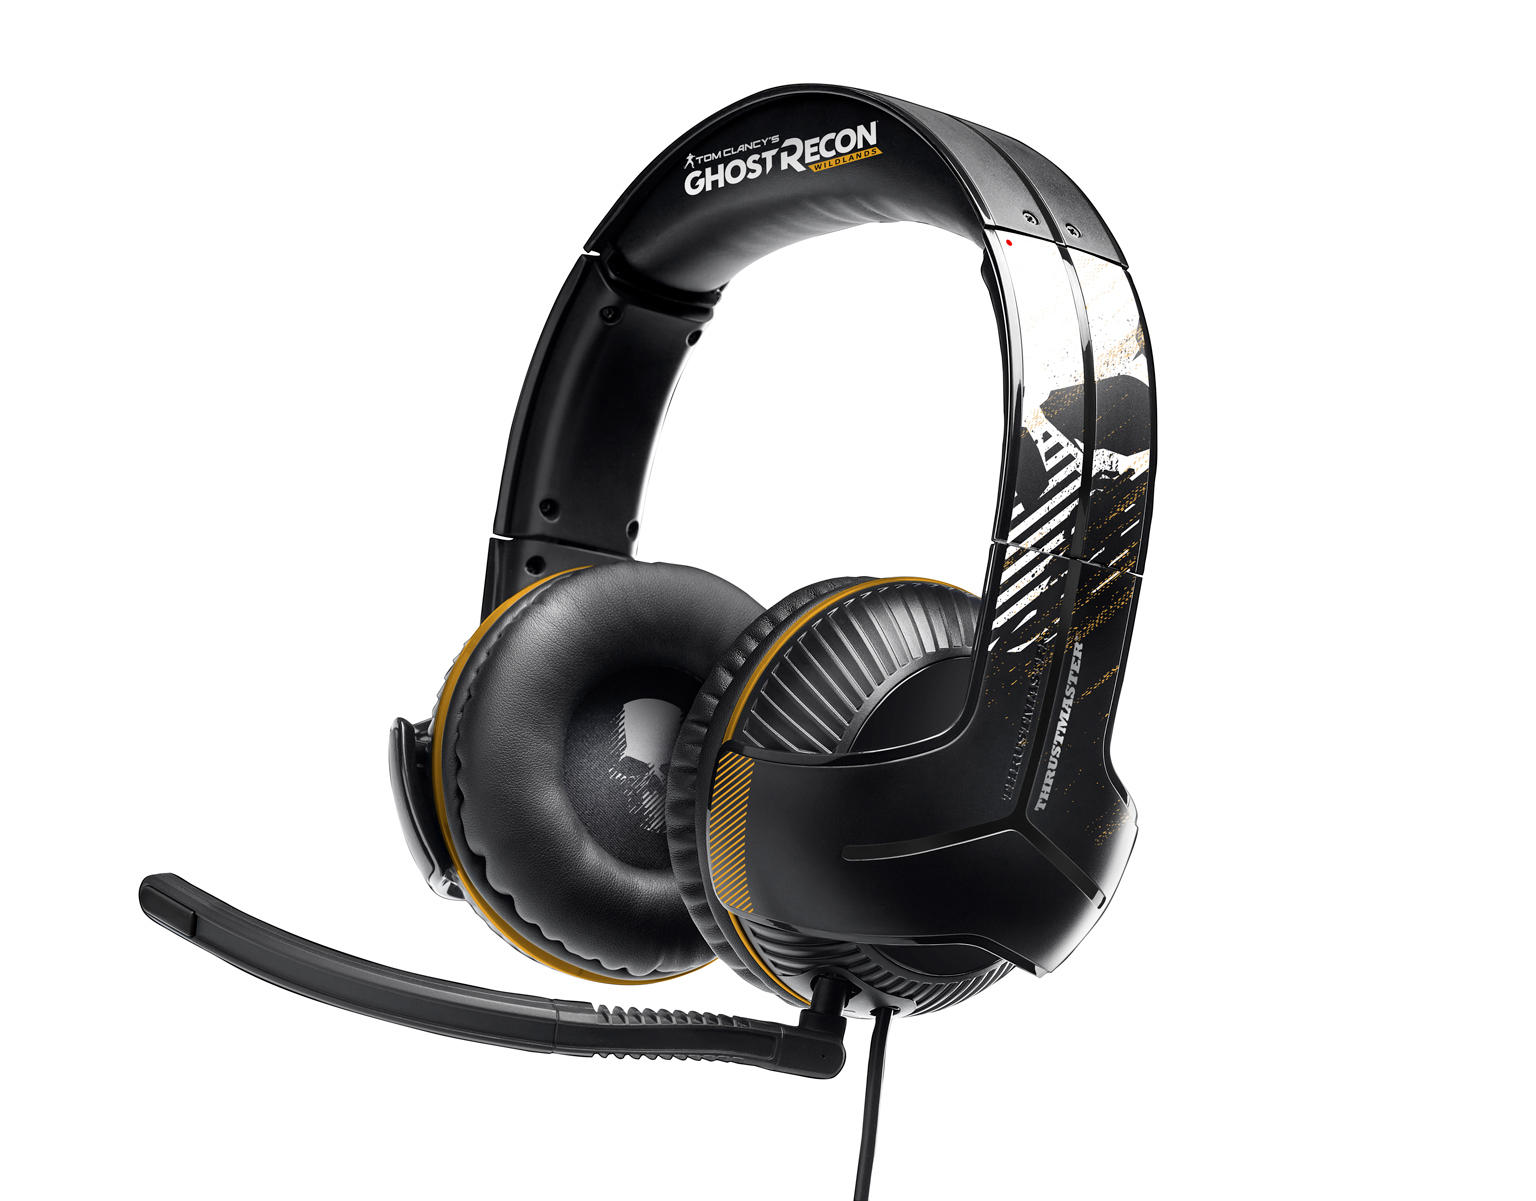 Herní sluchátka s mikrofonem Thrustmaster Y-350X GhostRecon edice pro Xbox One a PC